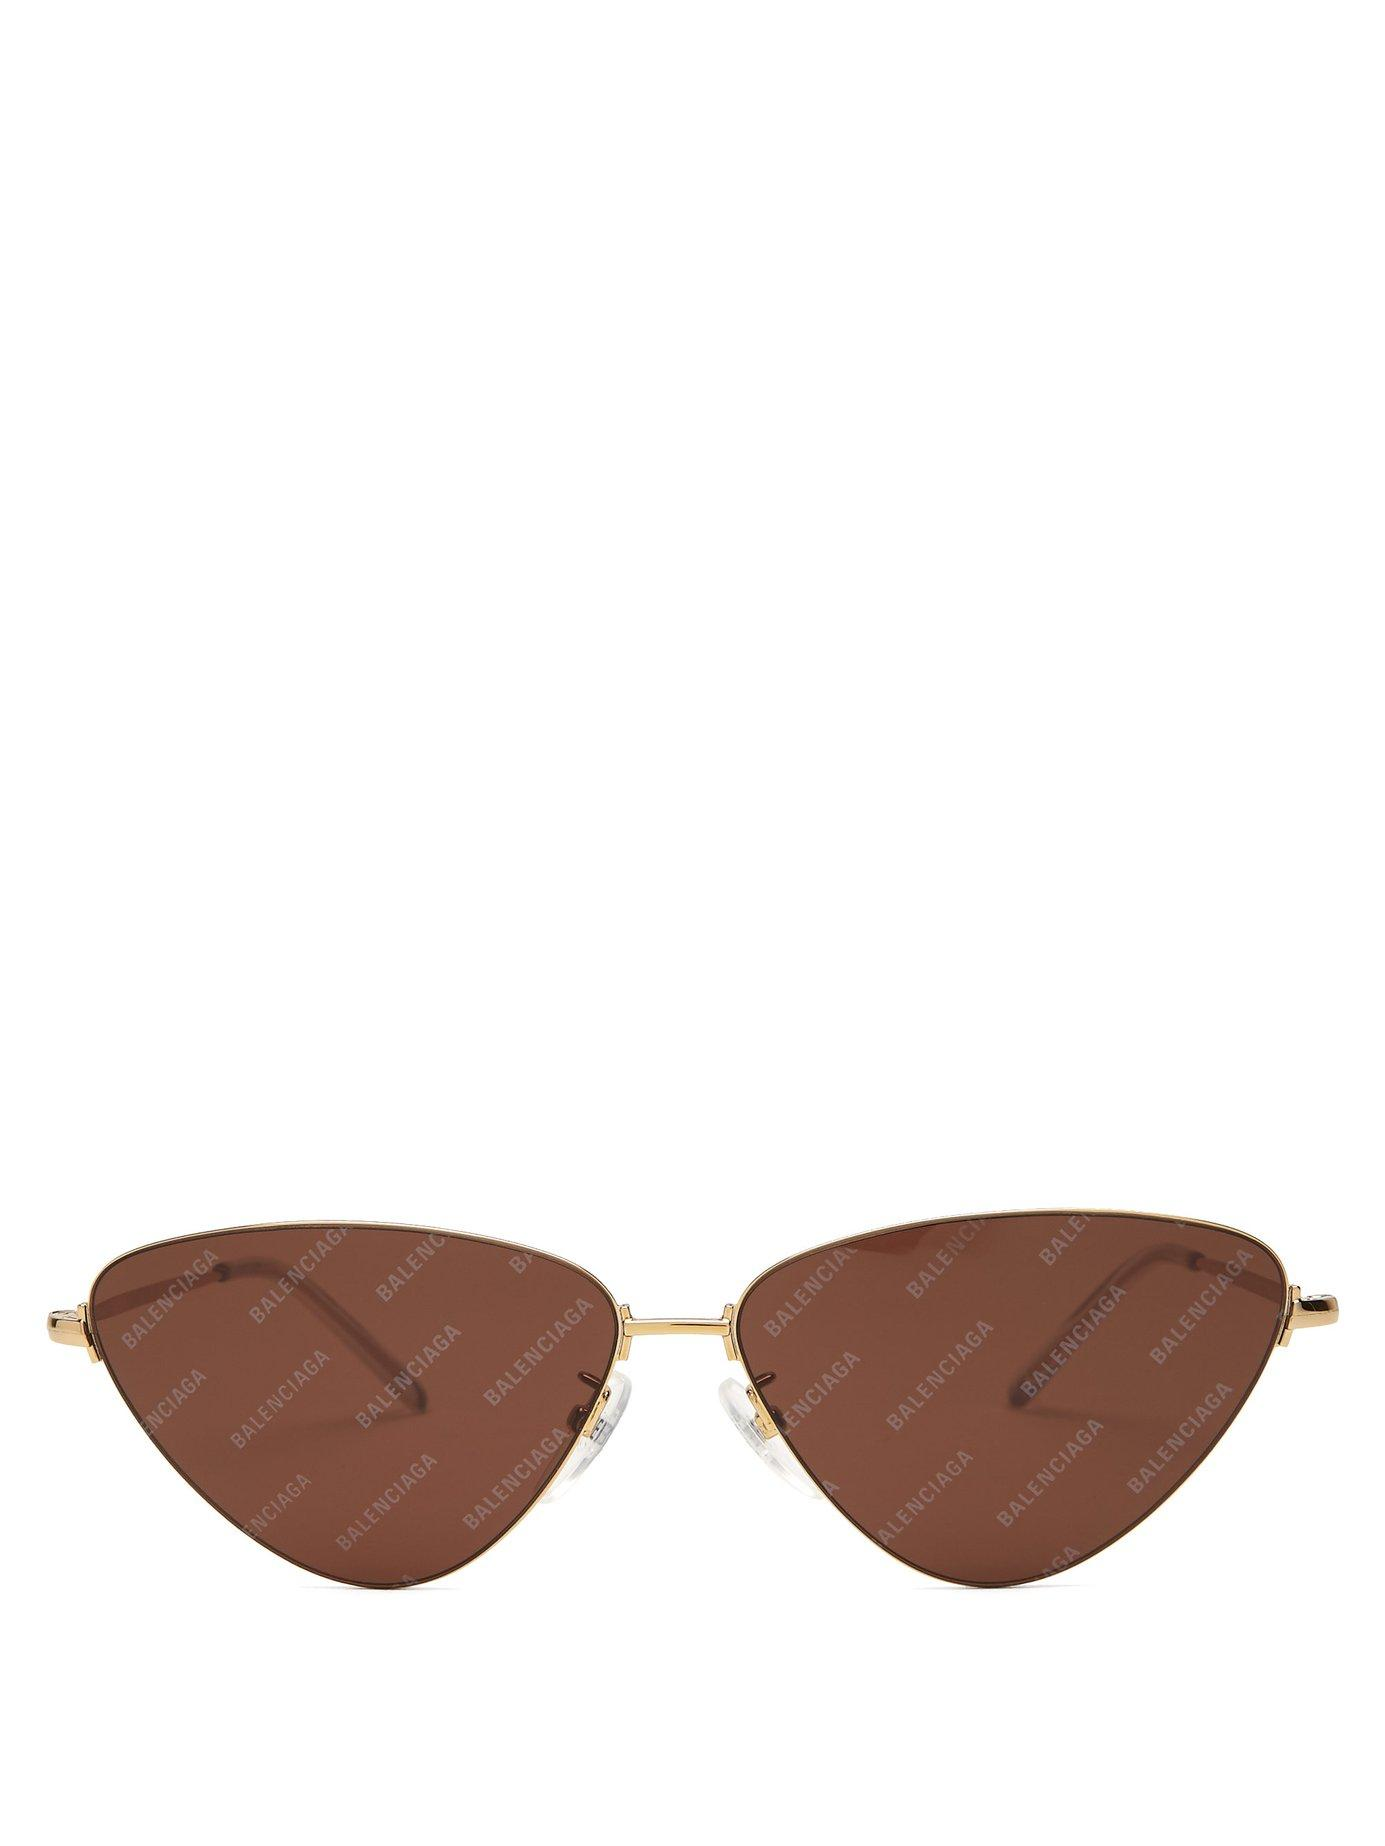 1f8e43d68d99 Lyst - Balenciaga Invisible Logo Cat Eye Metal Sunglasses in ...